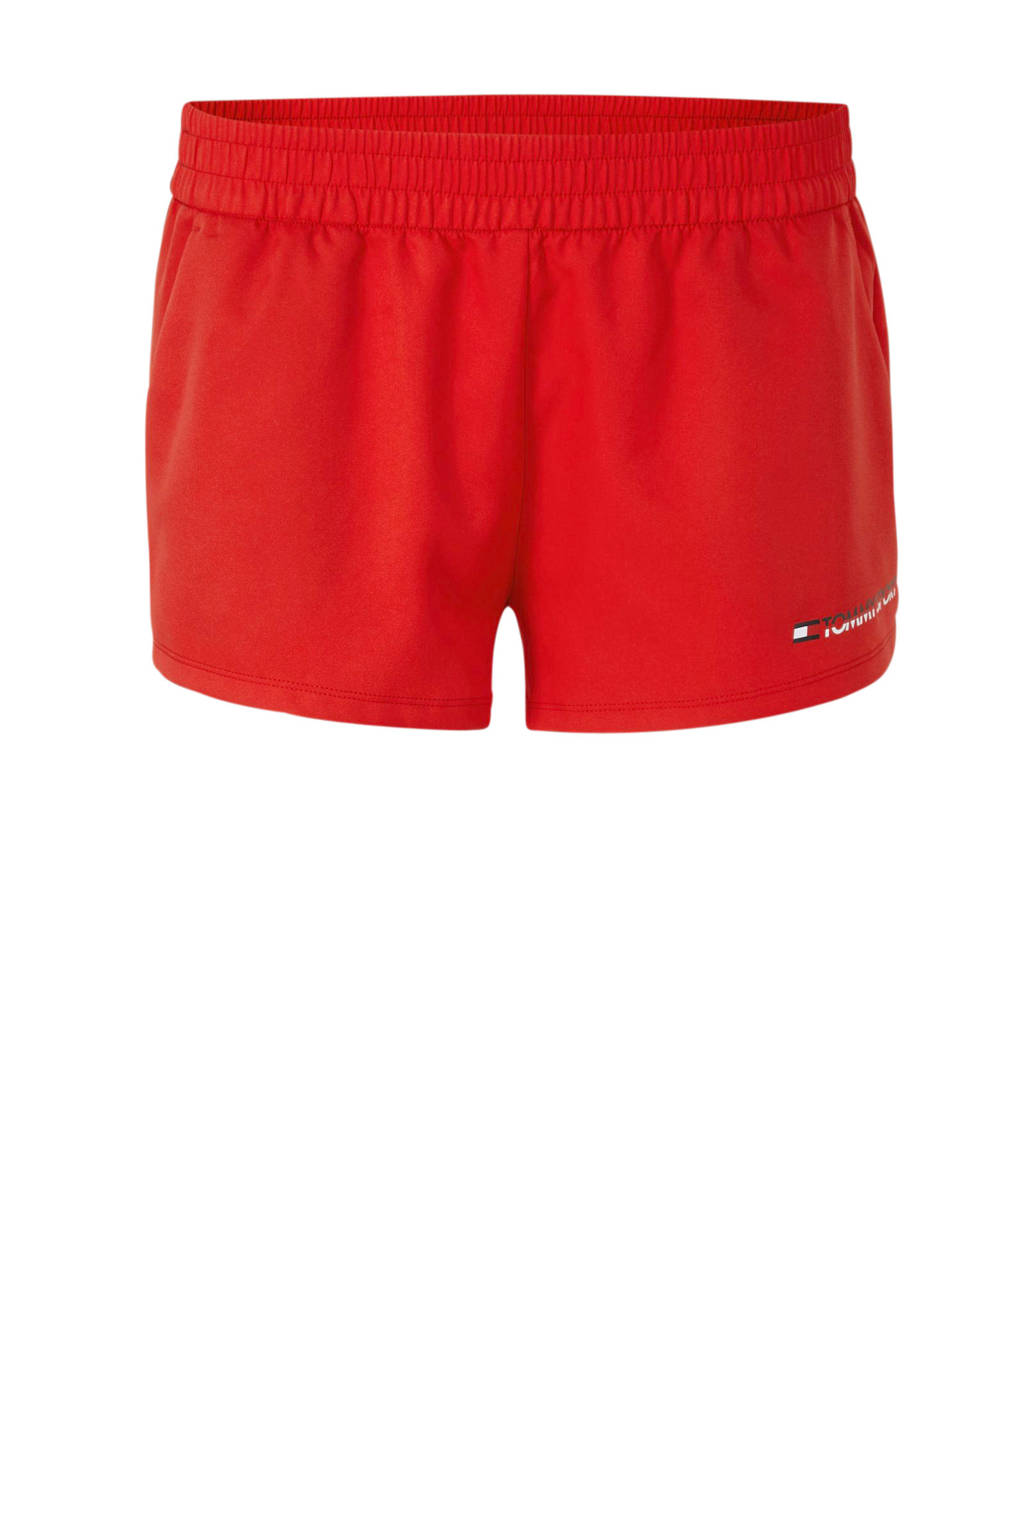 Tommy Hilfiger Sport sportshort rood, Rood